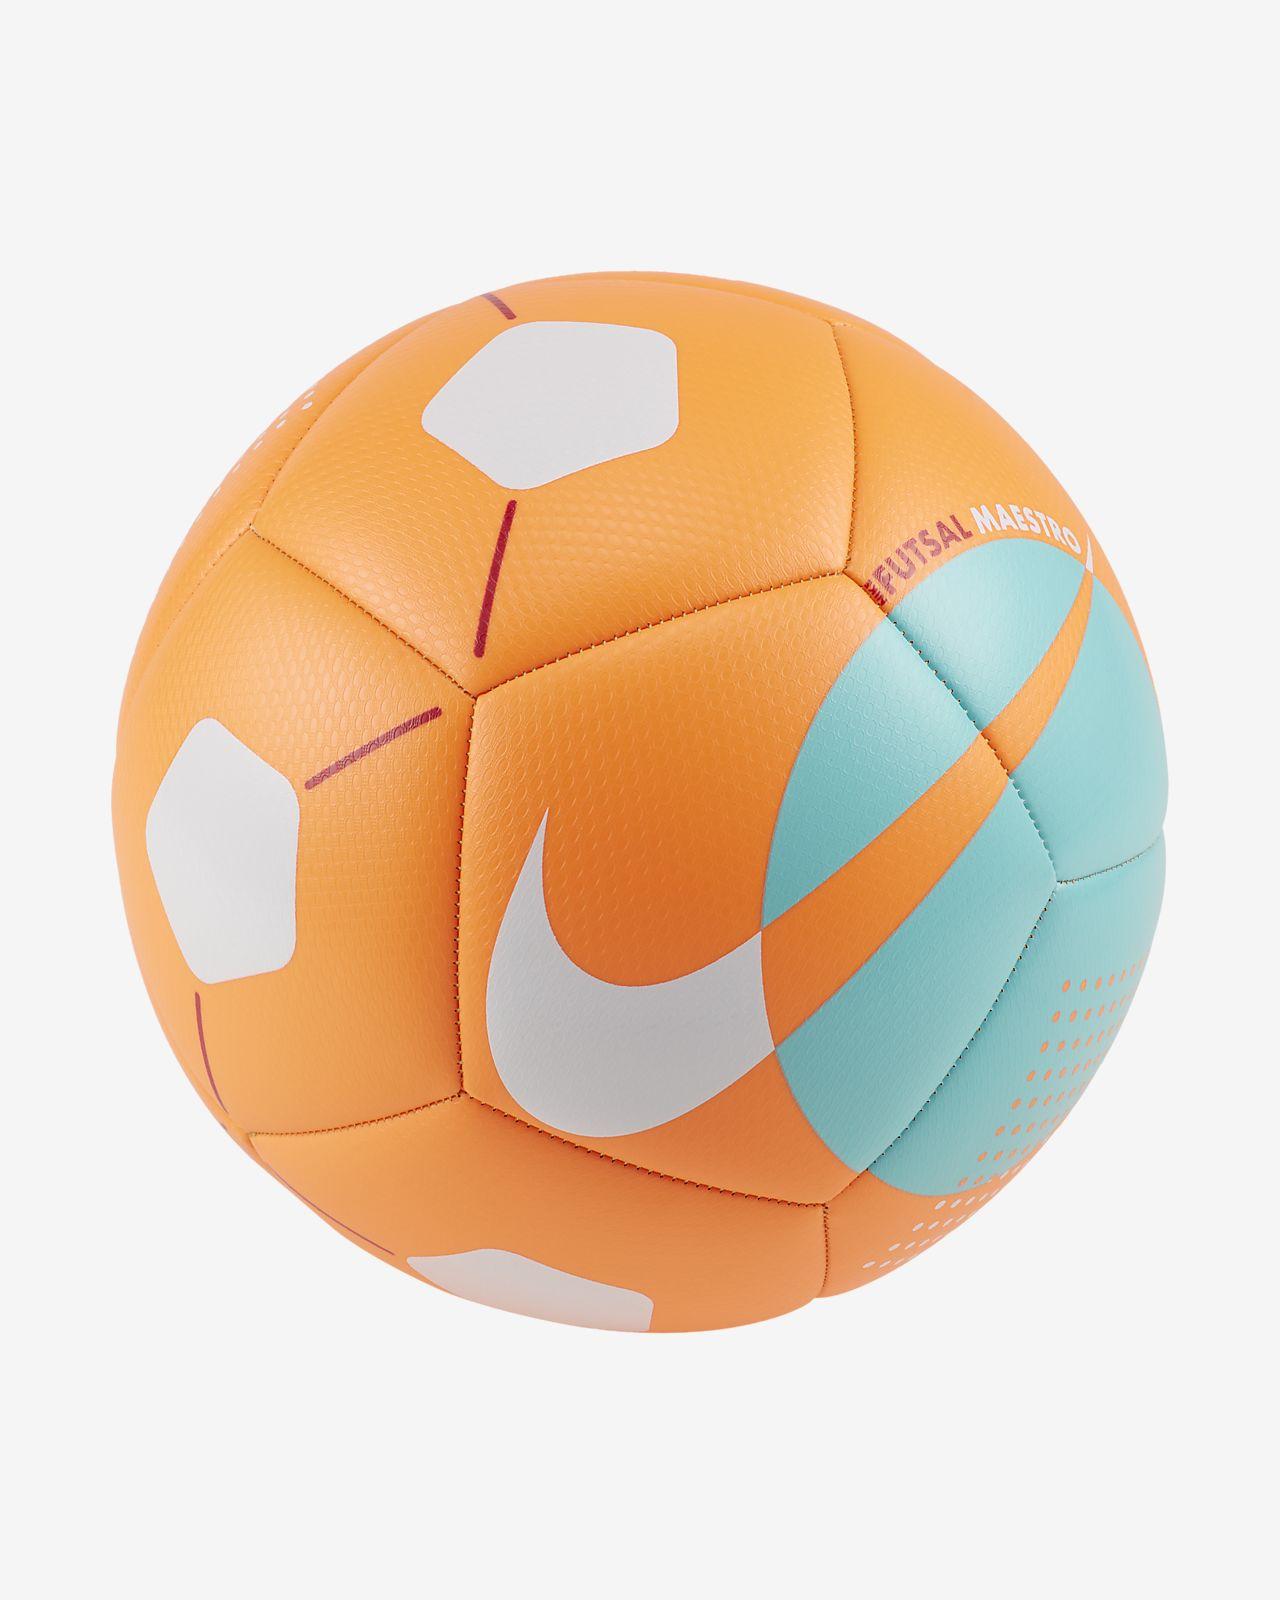 Details about Nike Elite socks custom Tennis Balls